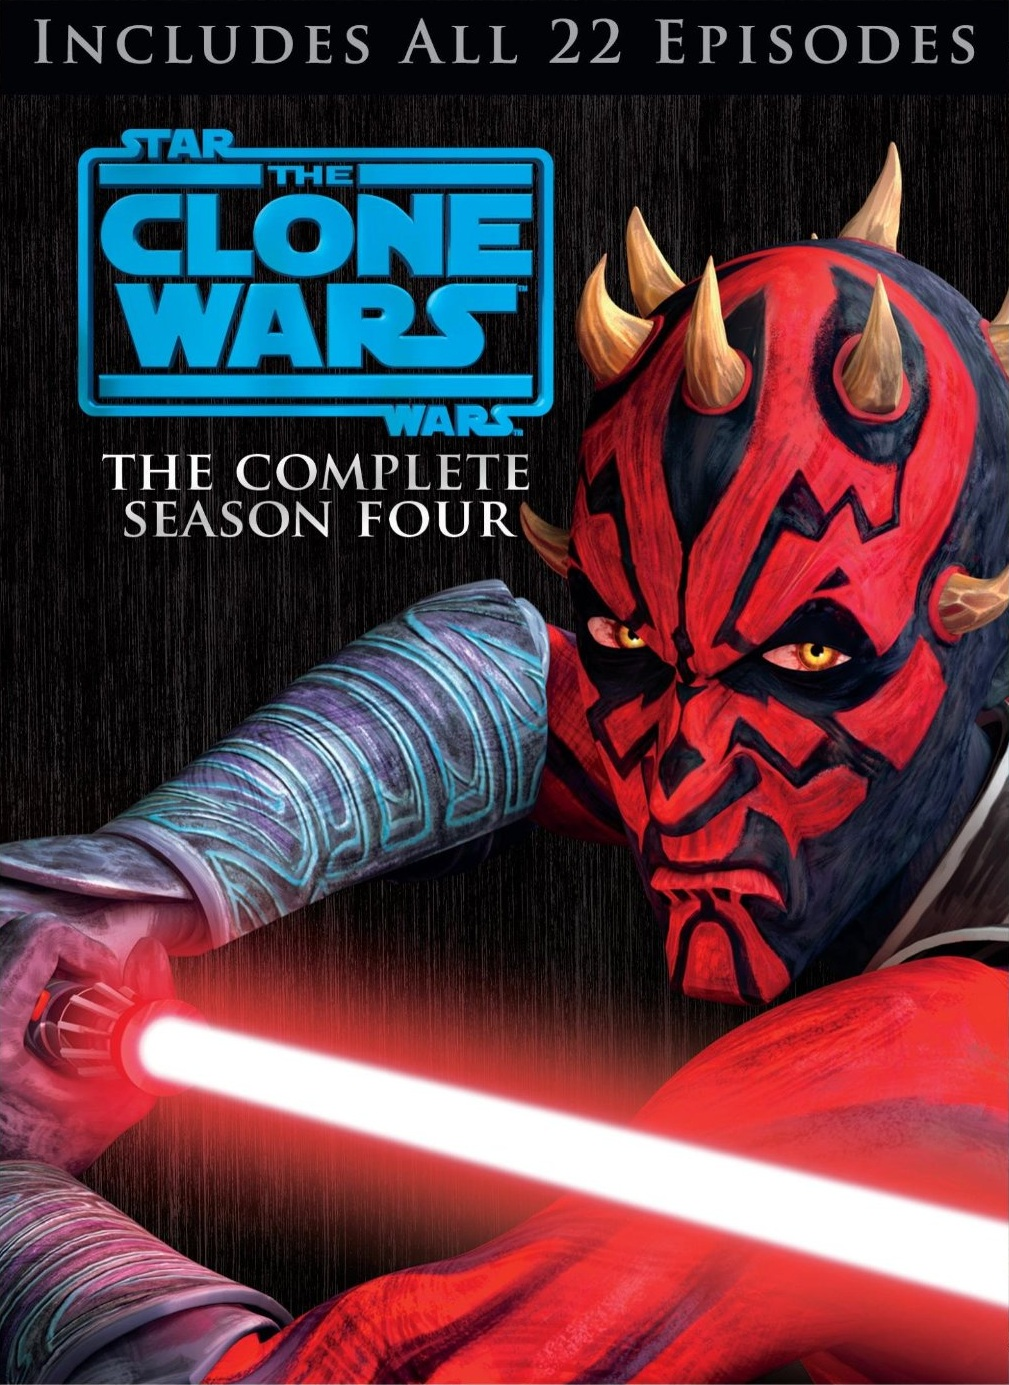 Star Wars: The Clone Wars - Season 4 (2011)